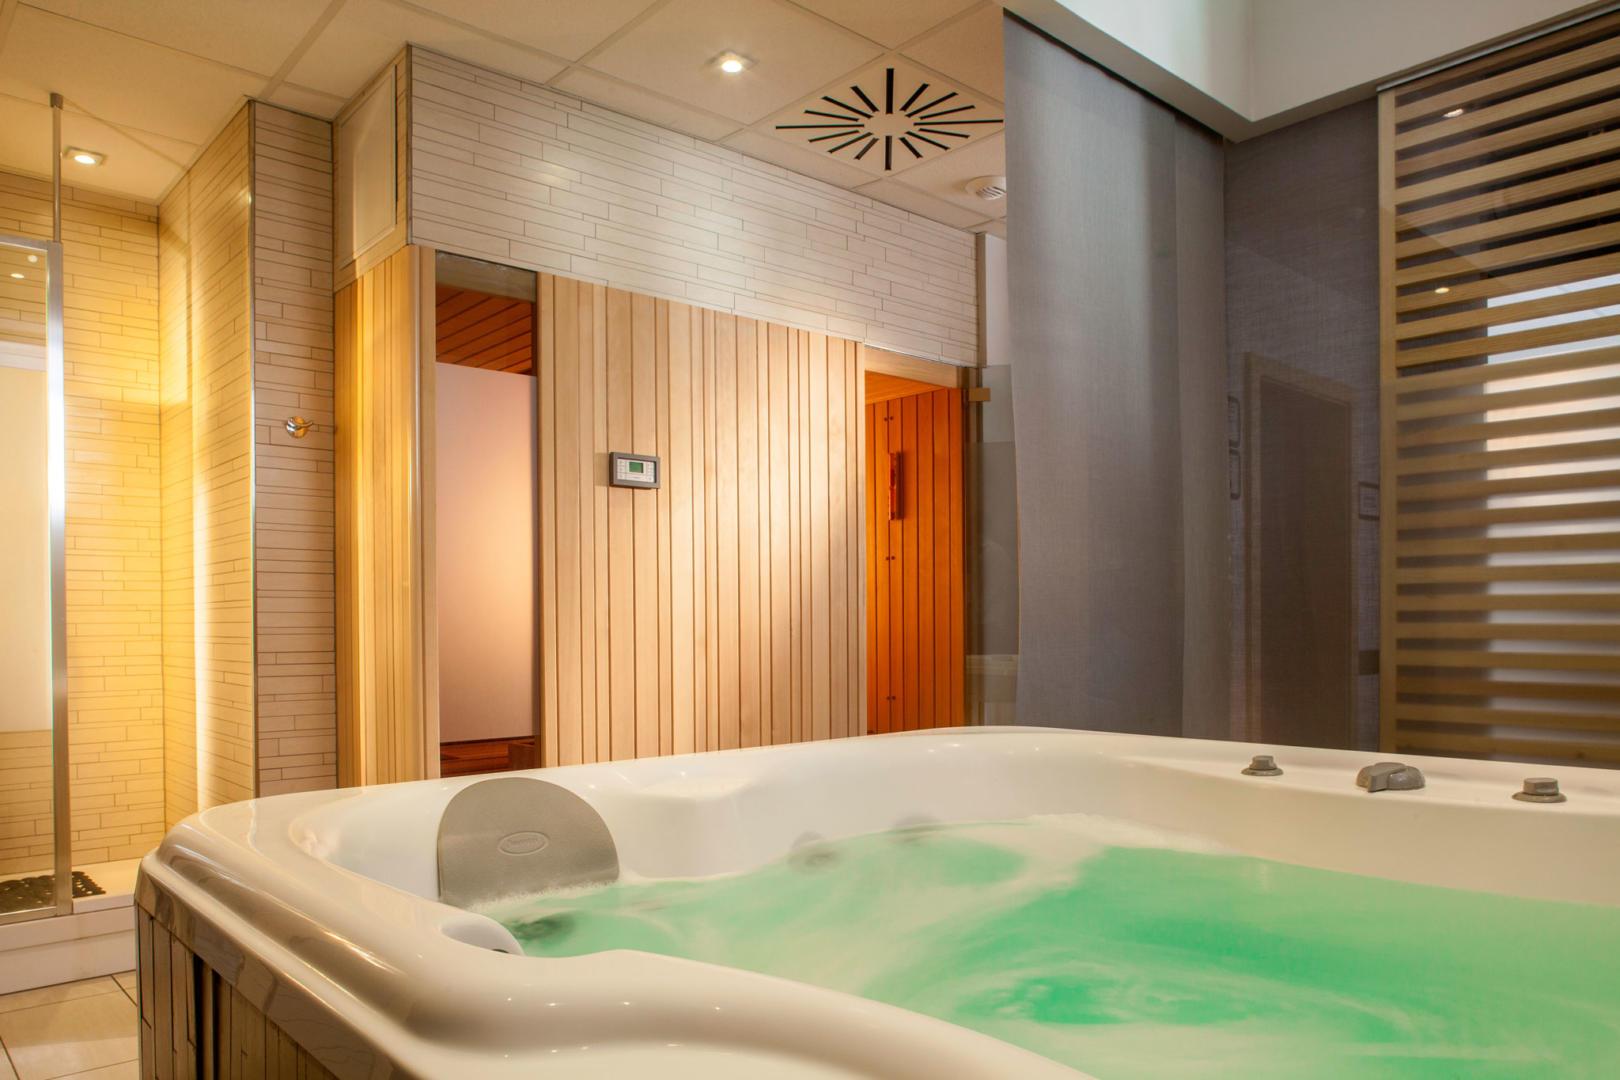 Spa Saint Louis sauna hammam jacuzzi